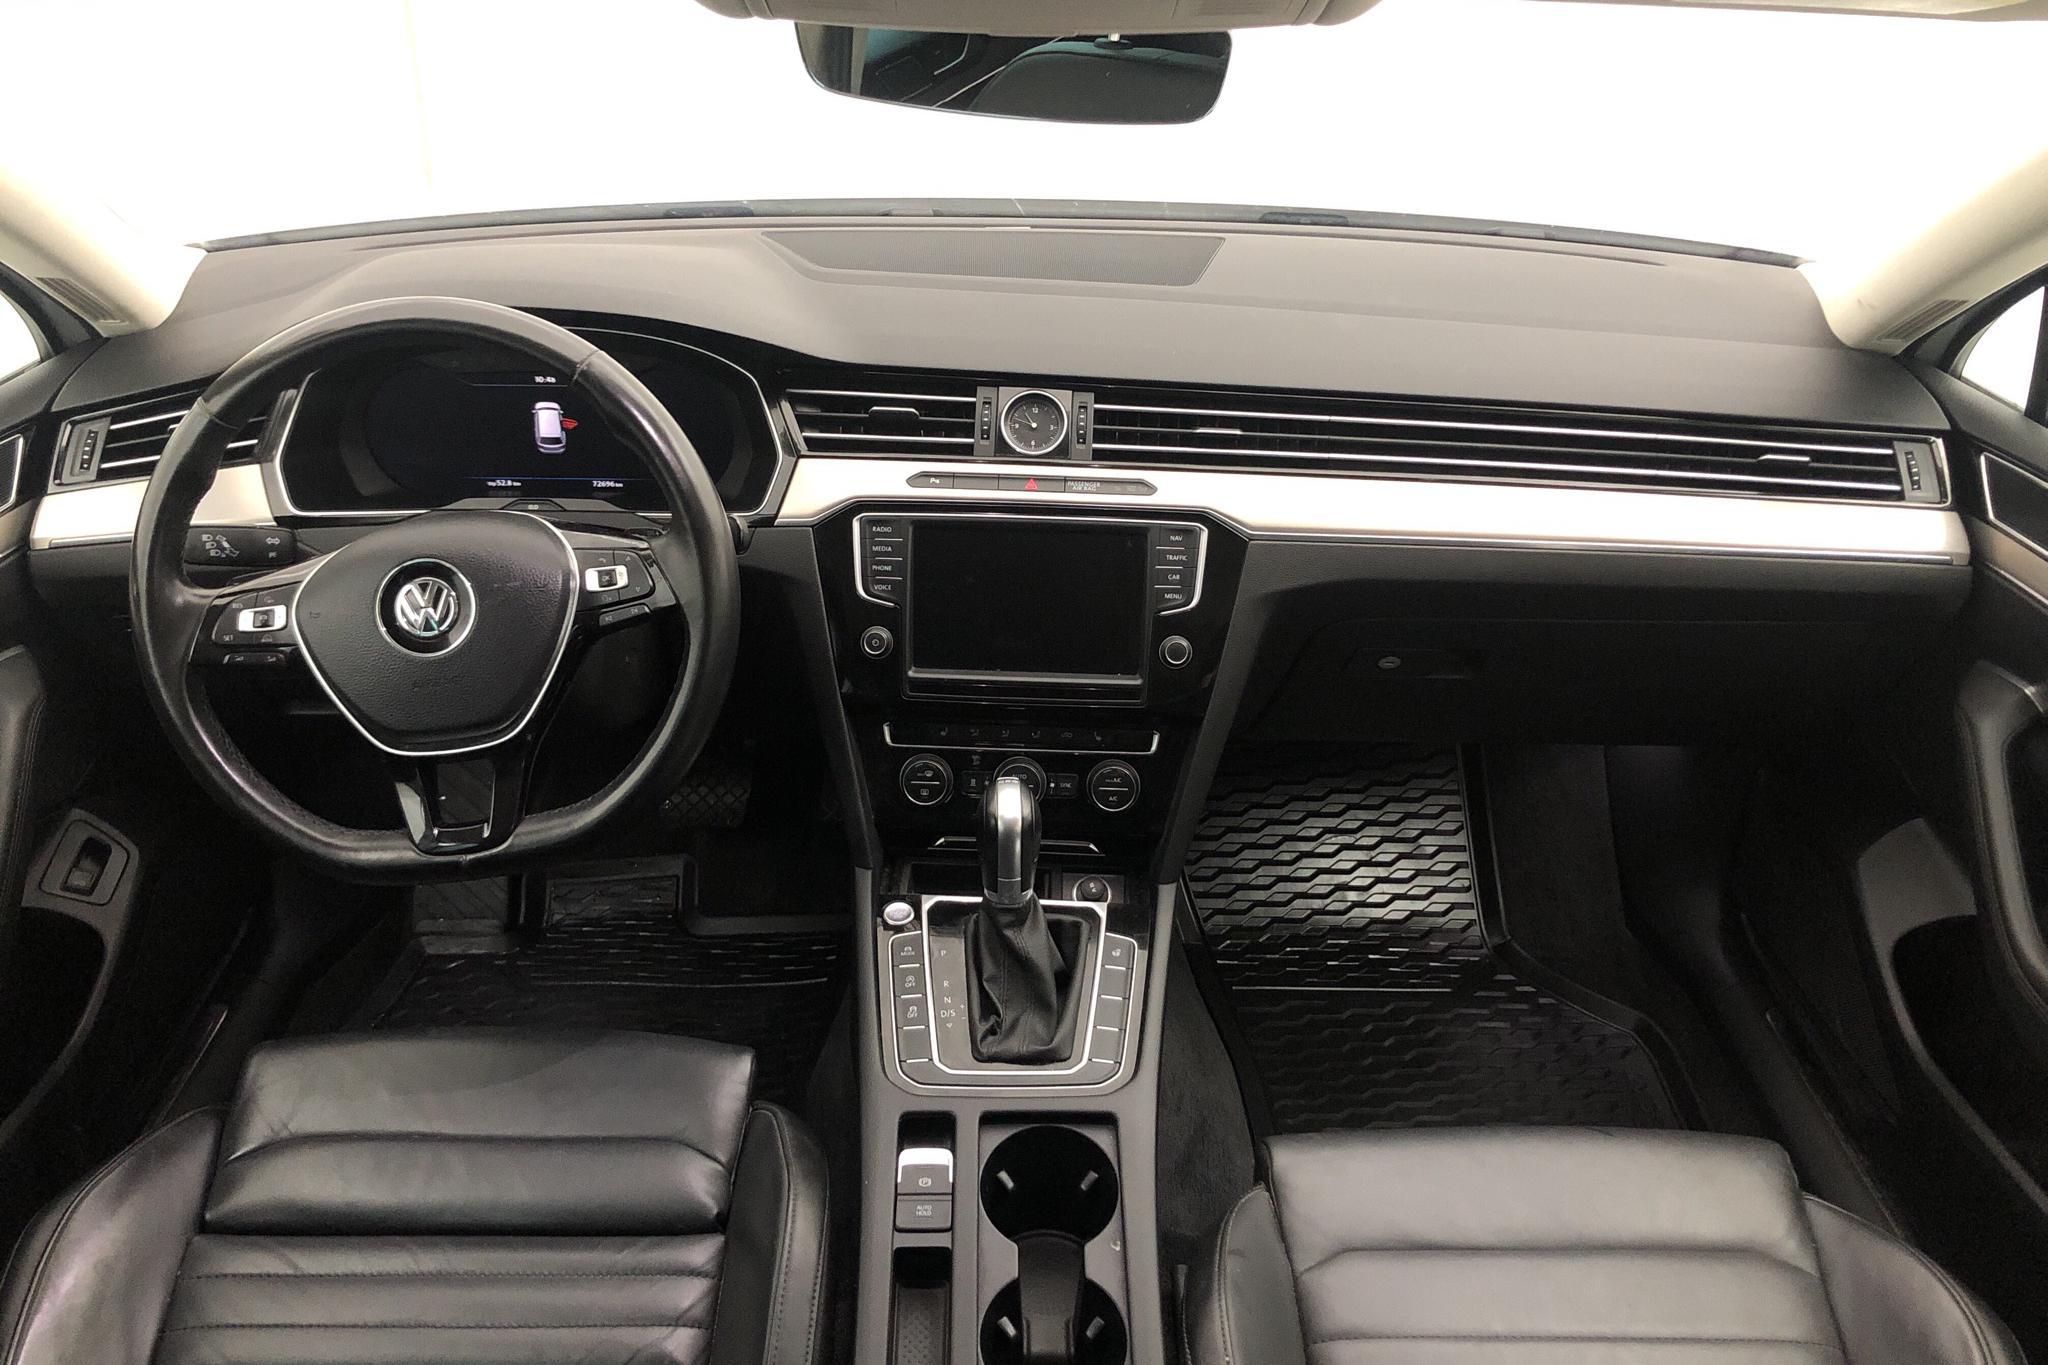 VW Passat 2.0 TDI BiTurbo Sportscombi 4MOTION (240hk) - 72 690 km - Automatic - white - 2017